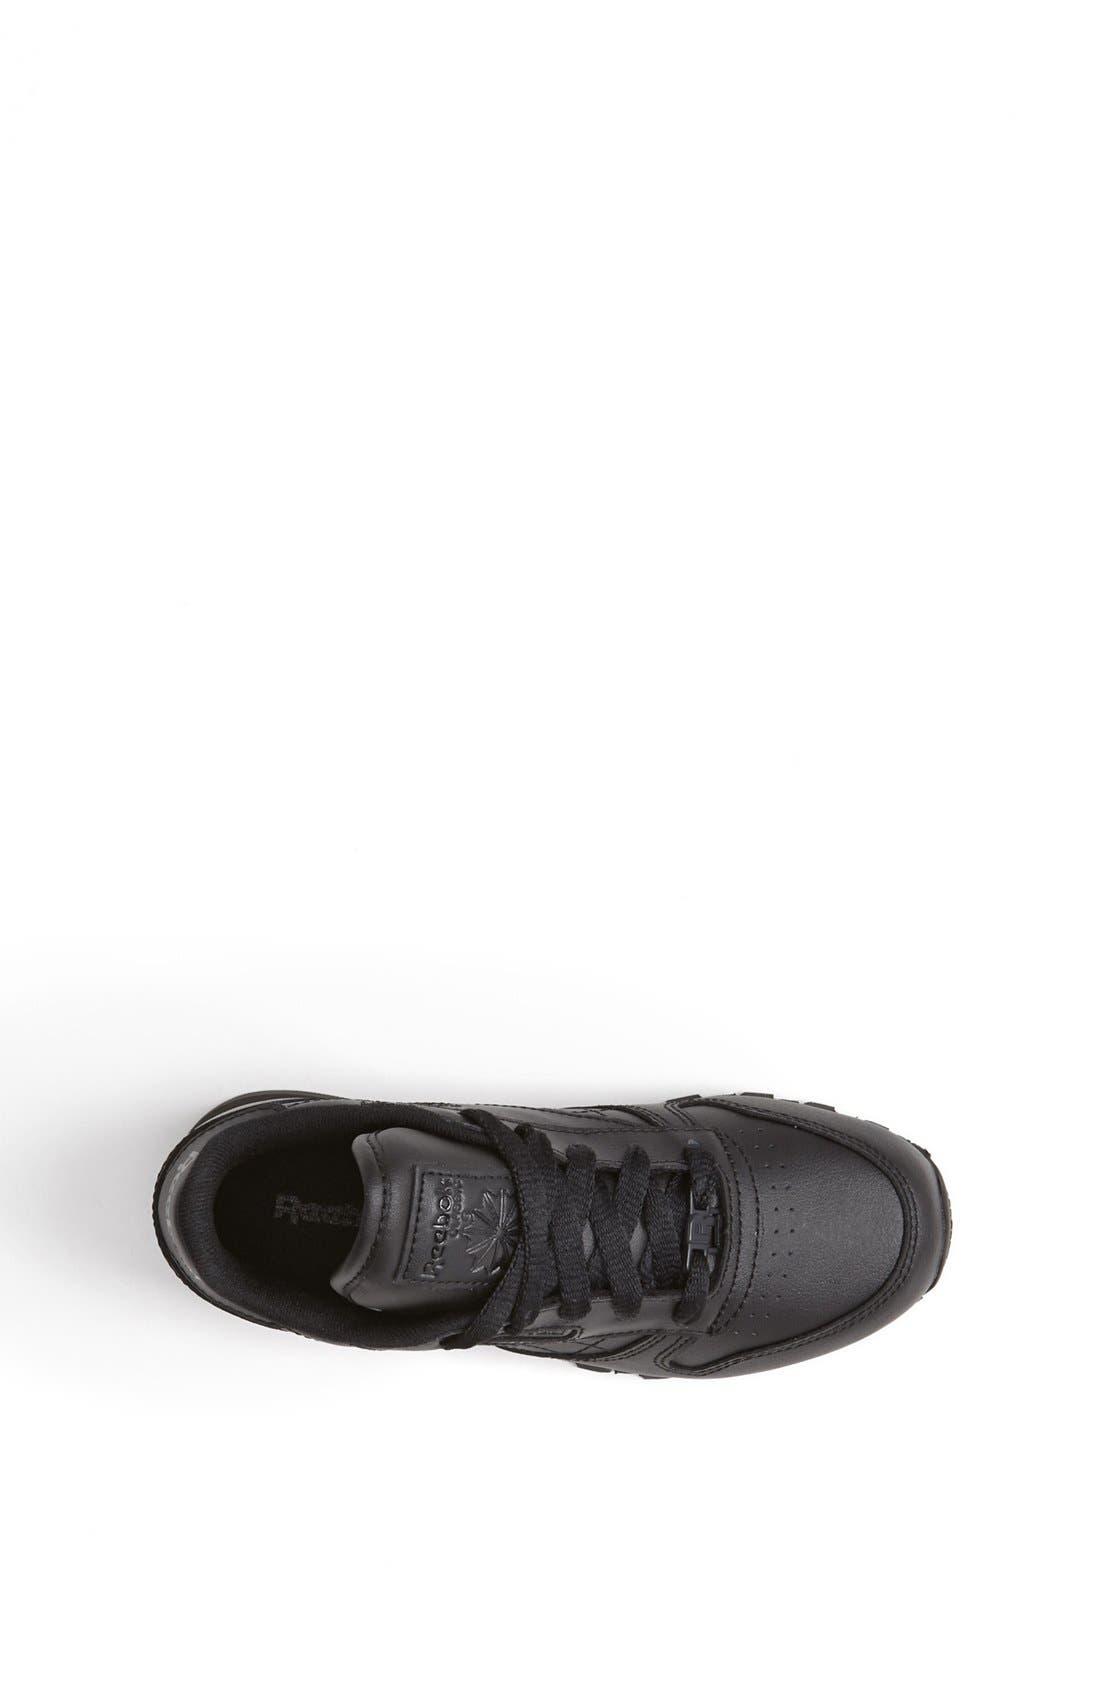 Alternate Image 3  - Reebok 'Classic' Leather Sneaker (Toddler & Little Kid)